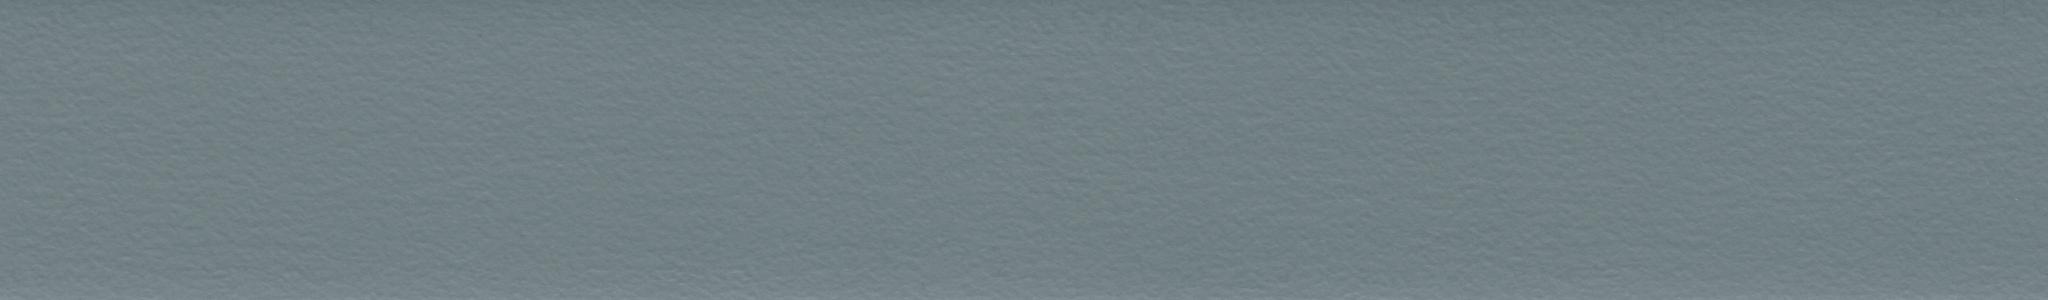 HU 17076 ABS Edge Grey Soft Pearl 107